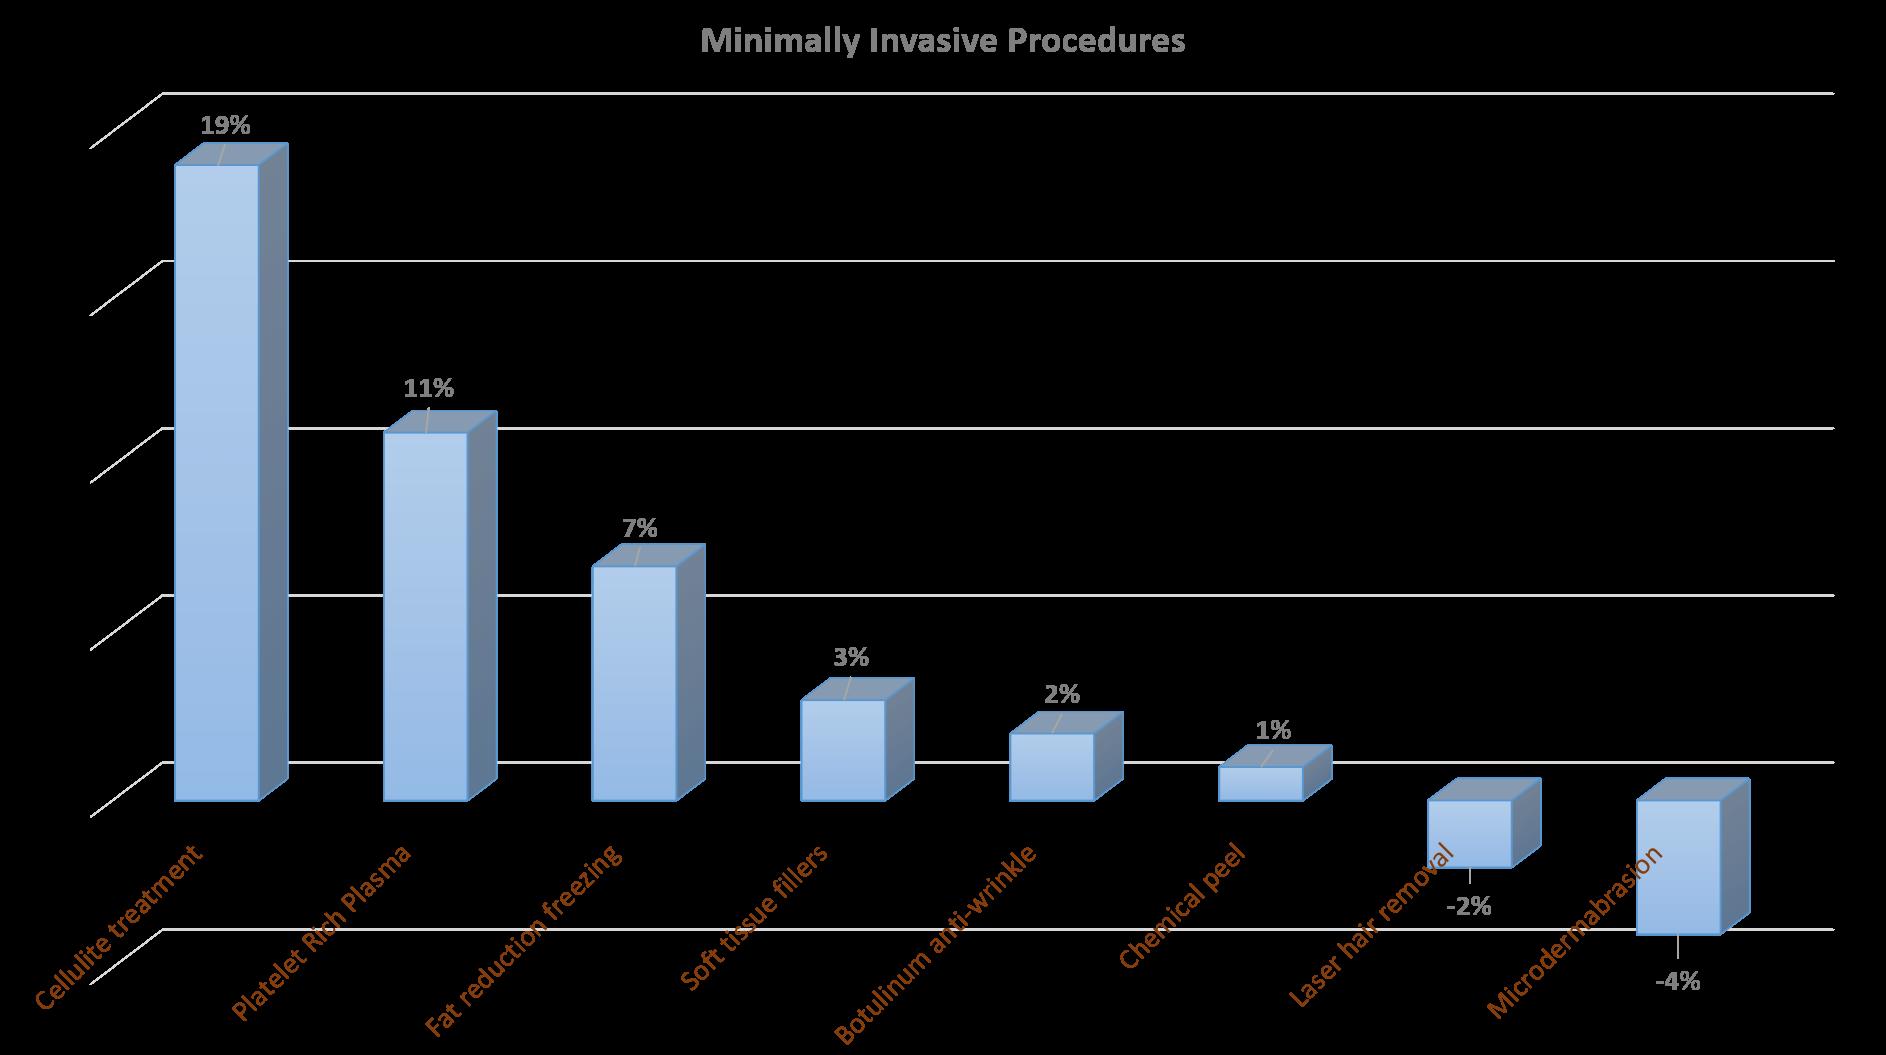 ASPS Chart 2